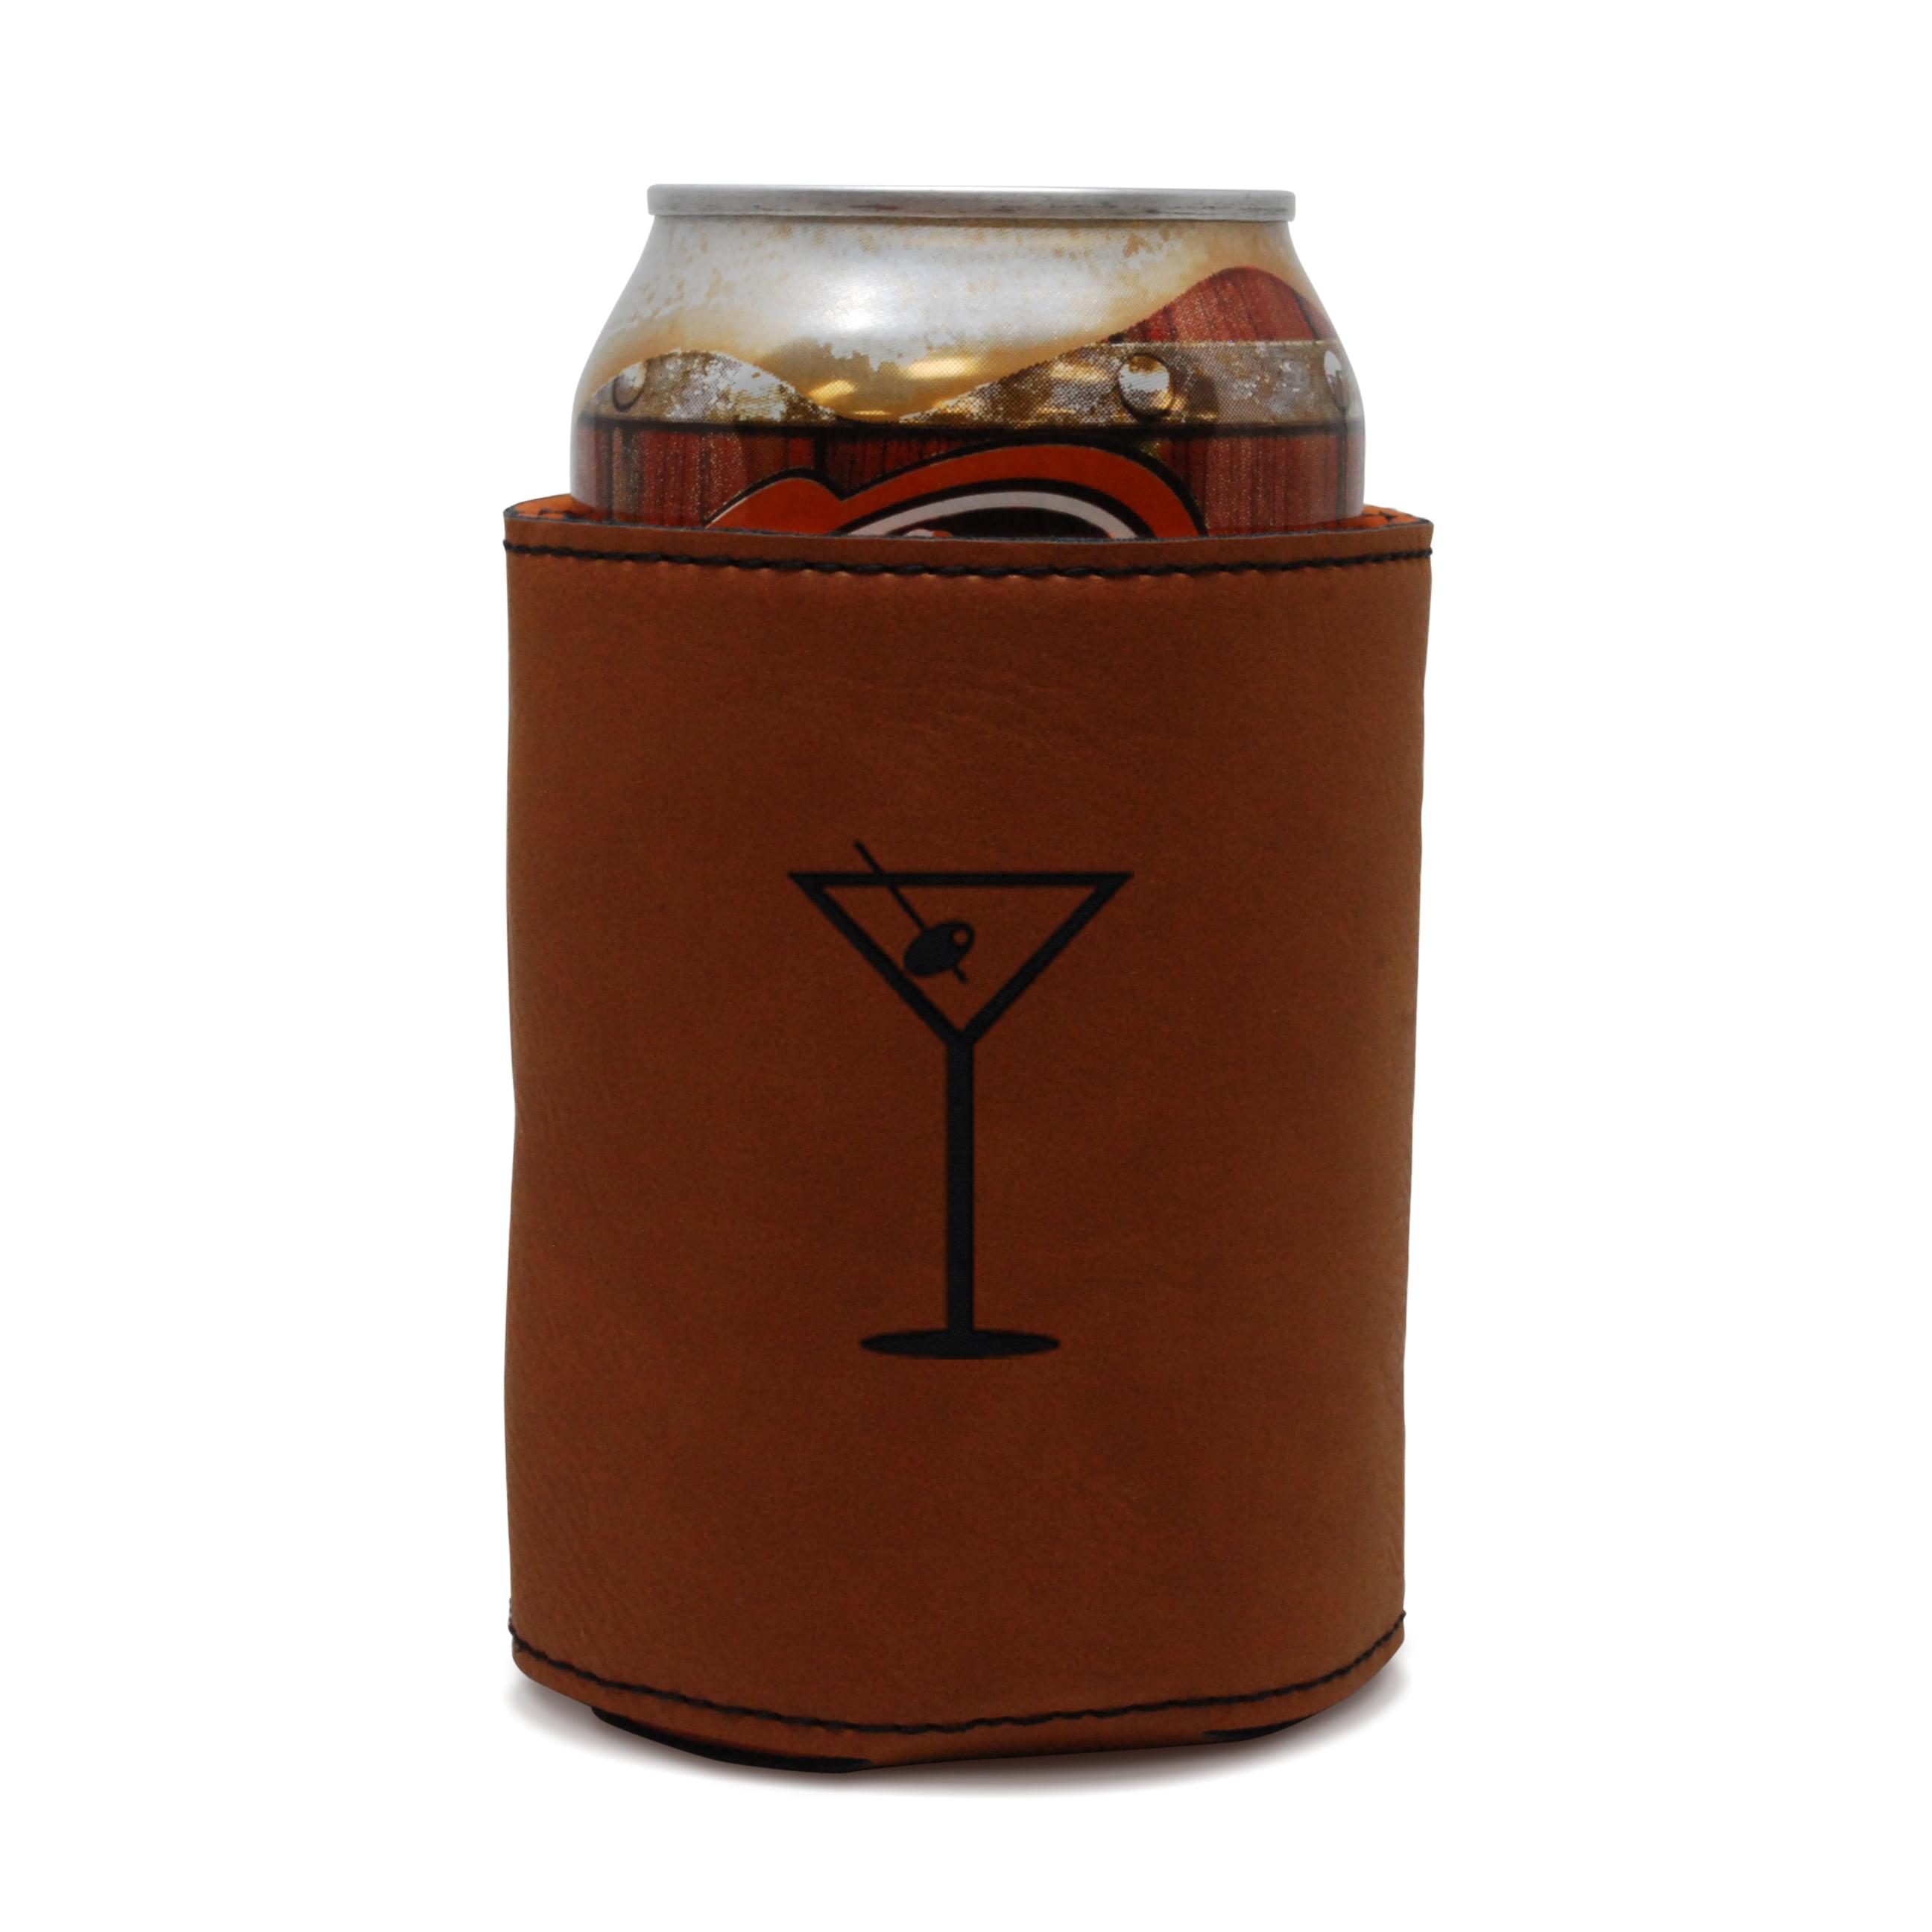 Martini Olive Leather Can Sleeve, Beer Sleeve, Beer Cooler, Beer Hugger by BigSpool Distributors